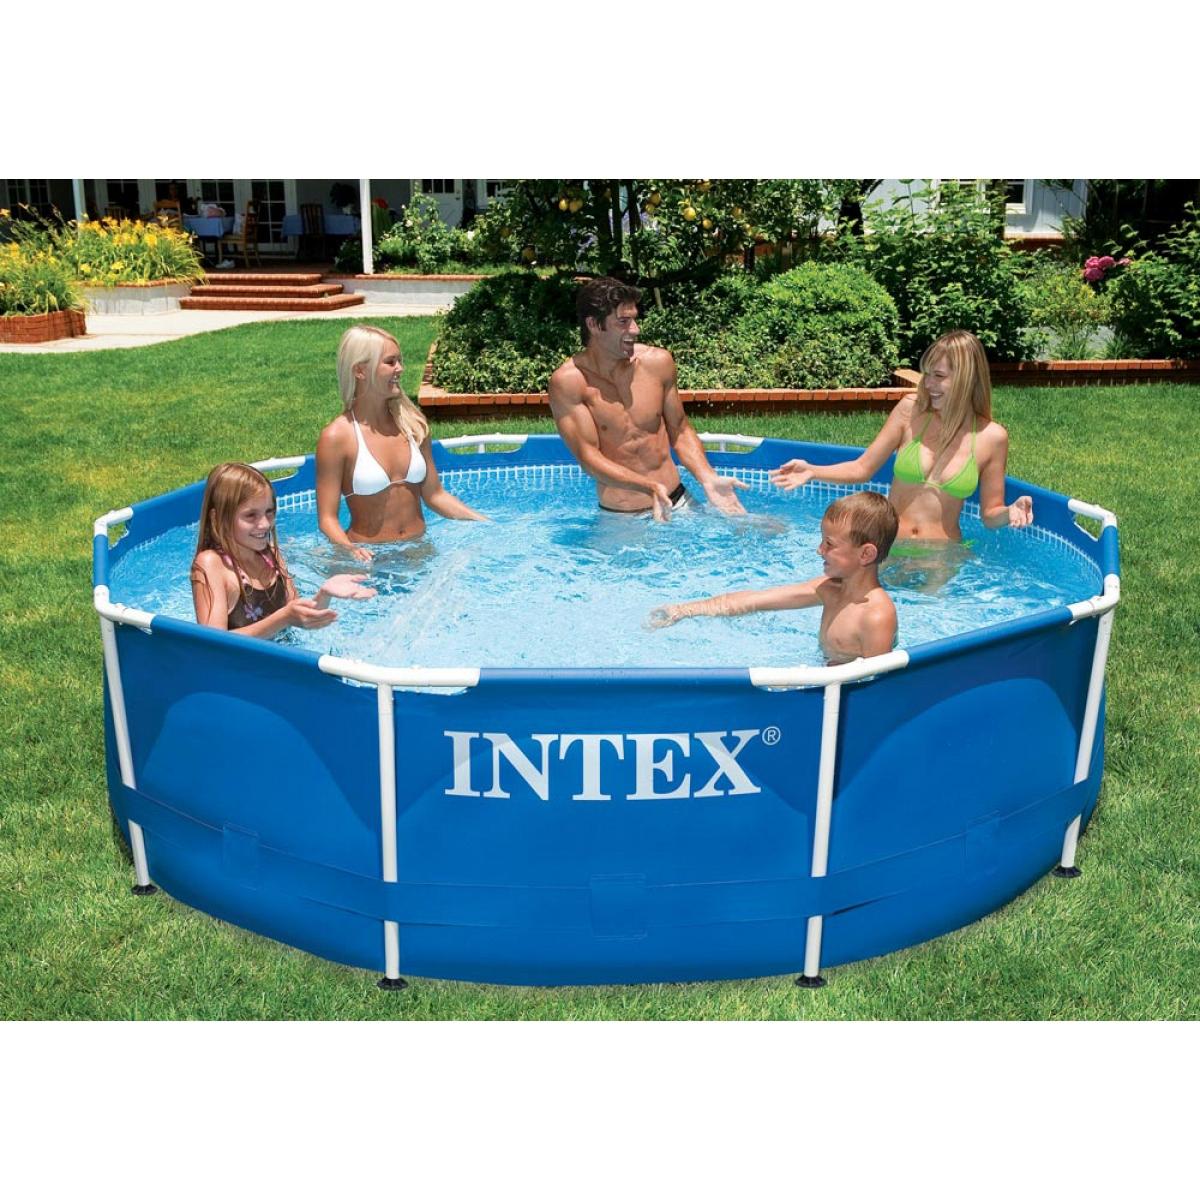 Piscina tonda fuoriterra intex 305x76 mod metal frame con - Filtri per piscine fuori terra ...